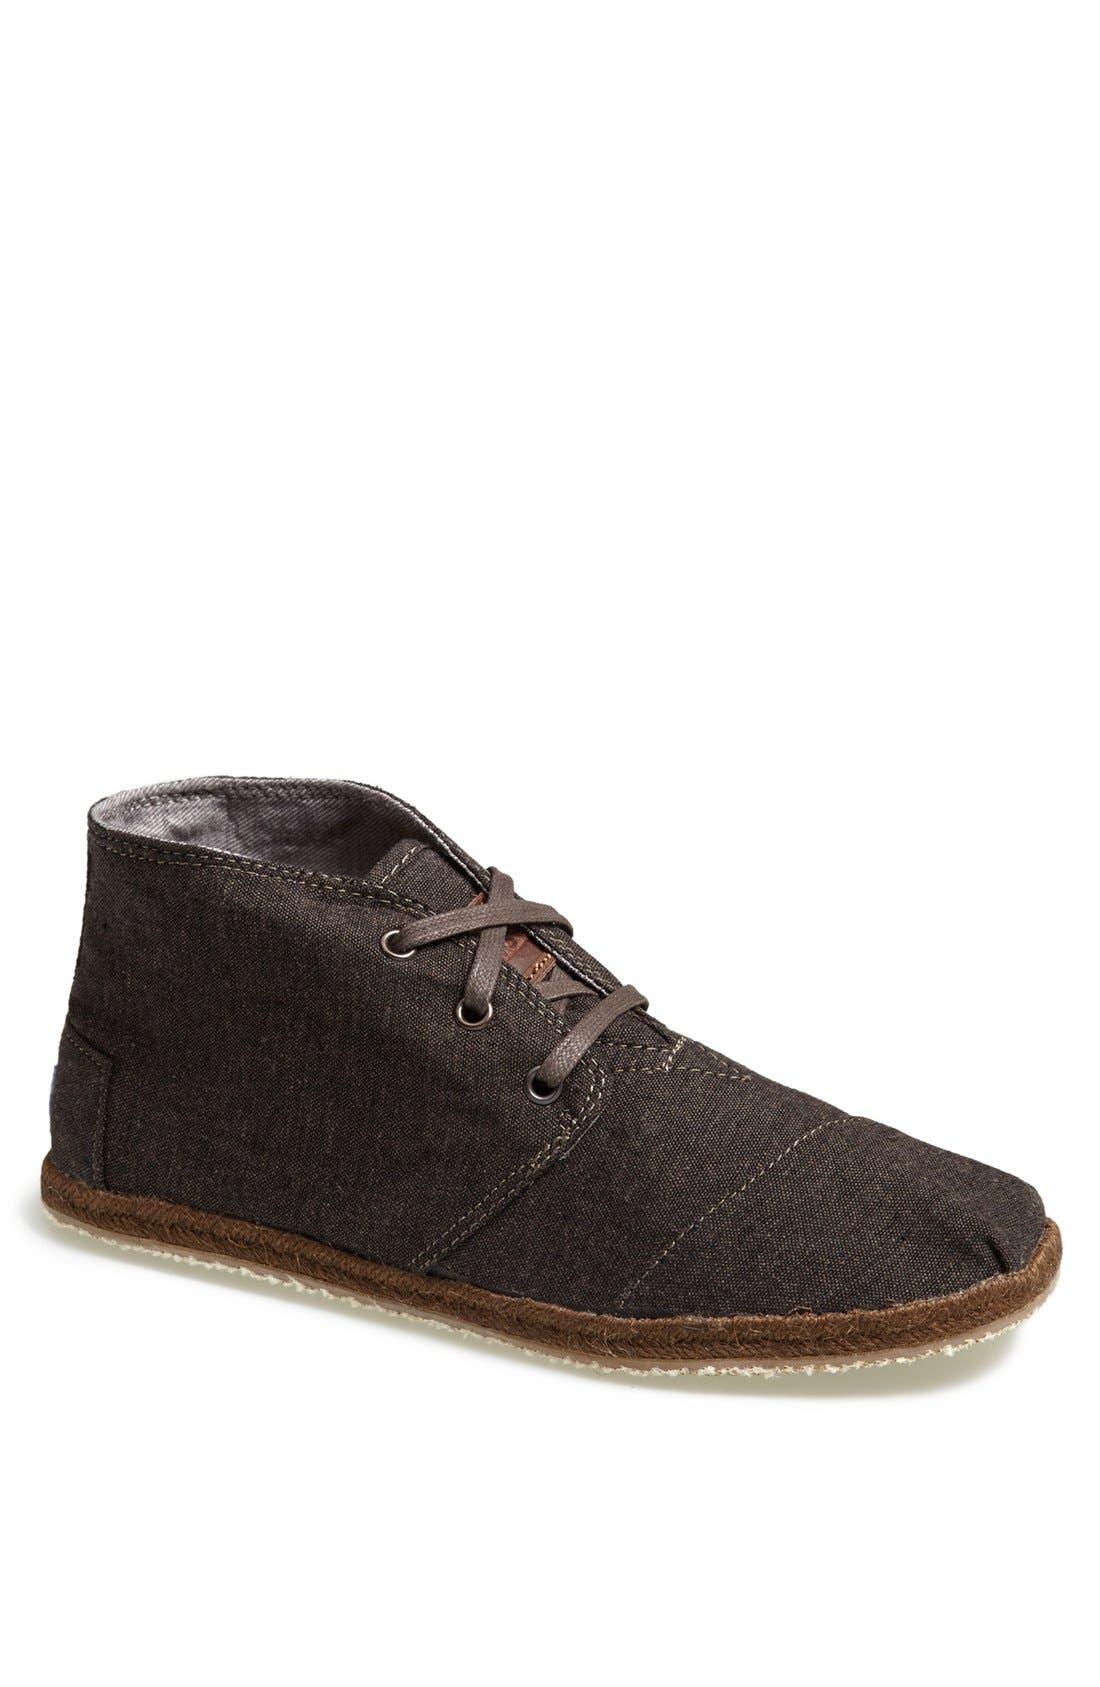 Alternate Image 1 Selected - TOMS 'Botas - Desert' Denim Boot (Men)